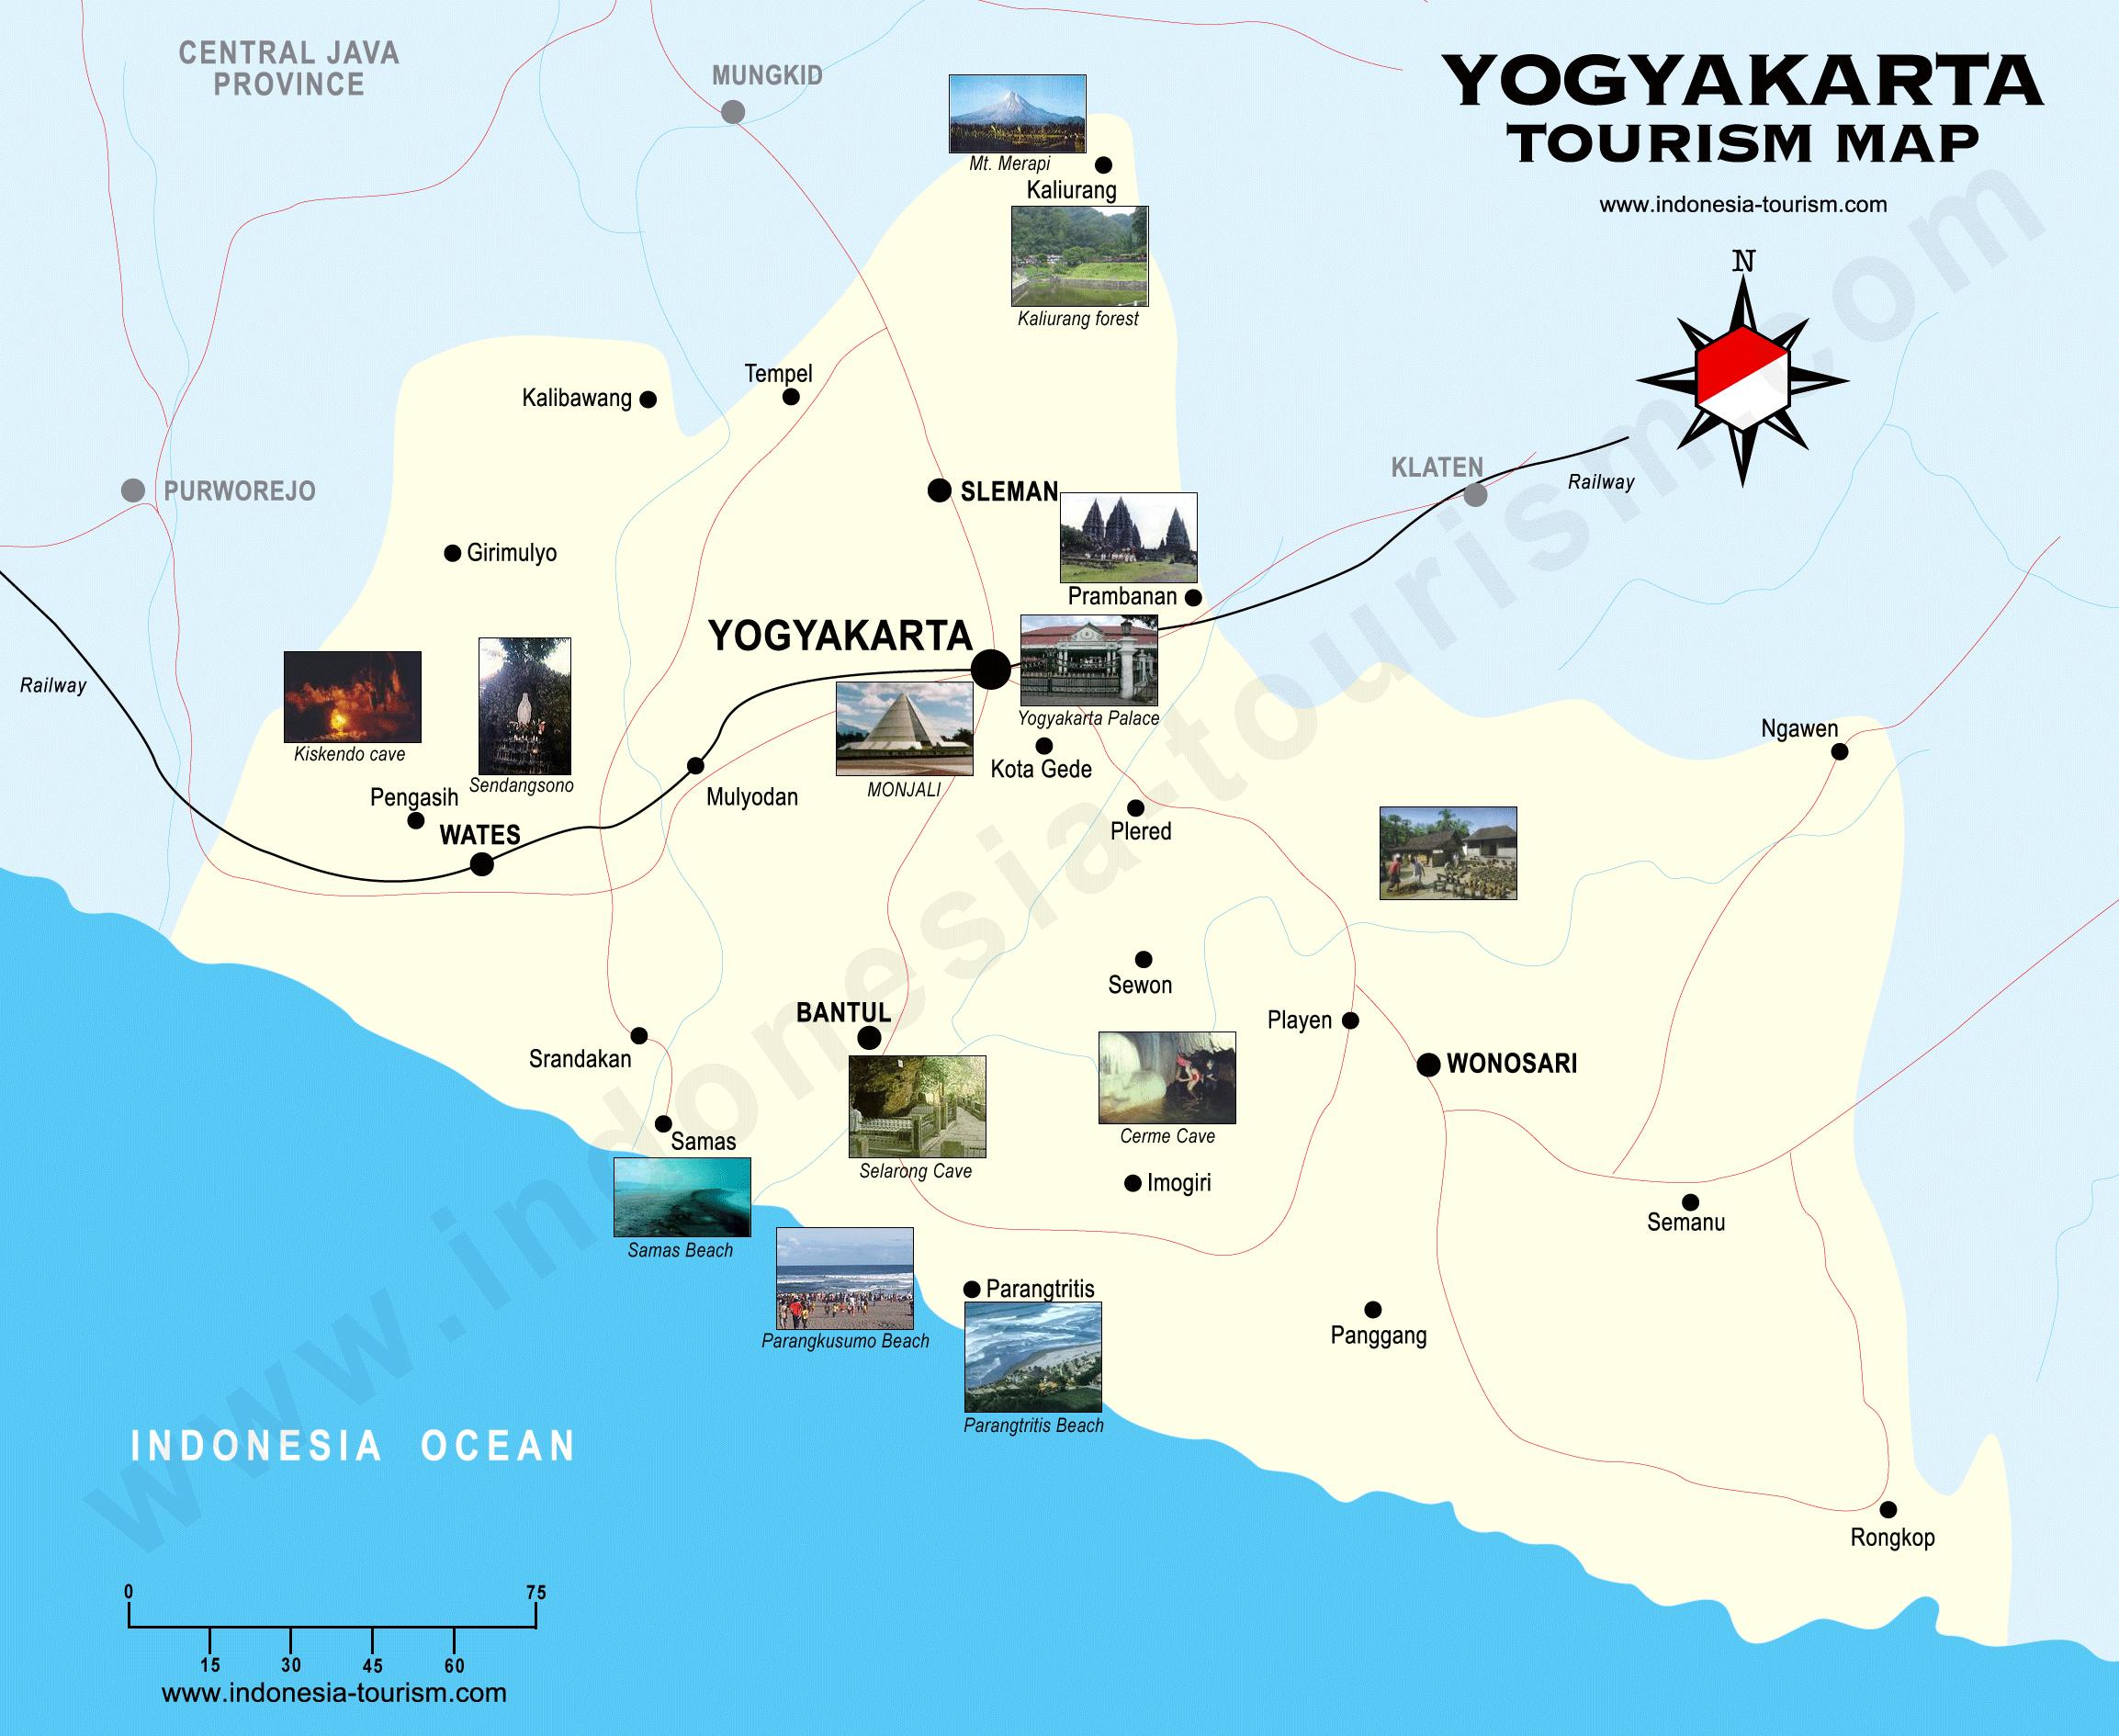 Yogyakarta Map - Jogjakarta Map - Peta Jogja - Peta Yogya on map of ta, map of ei, map of ke, map of cf, map of oo, map of ep, map of cl, map of mono, map of er, map of le, map of ps, map of dj, map of re, map of bx, map of ce, map of ad, map of ra, map of ci, map of dv, map of tri,